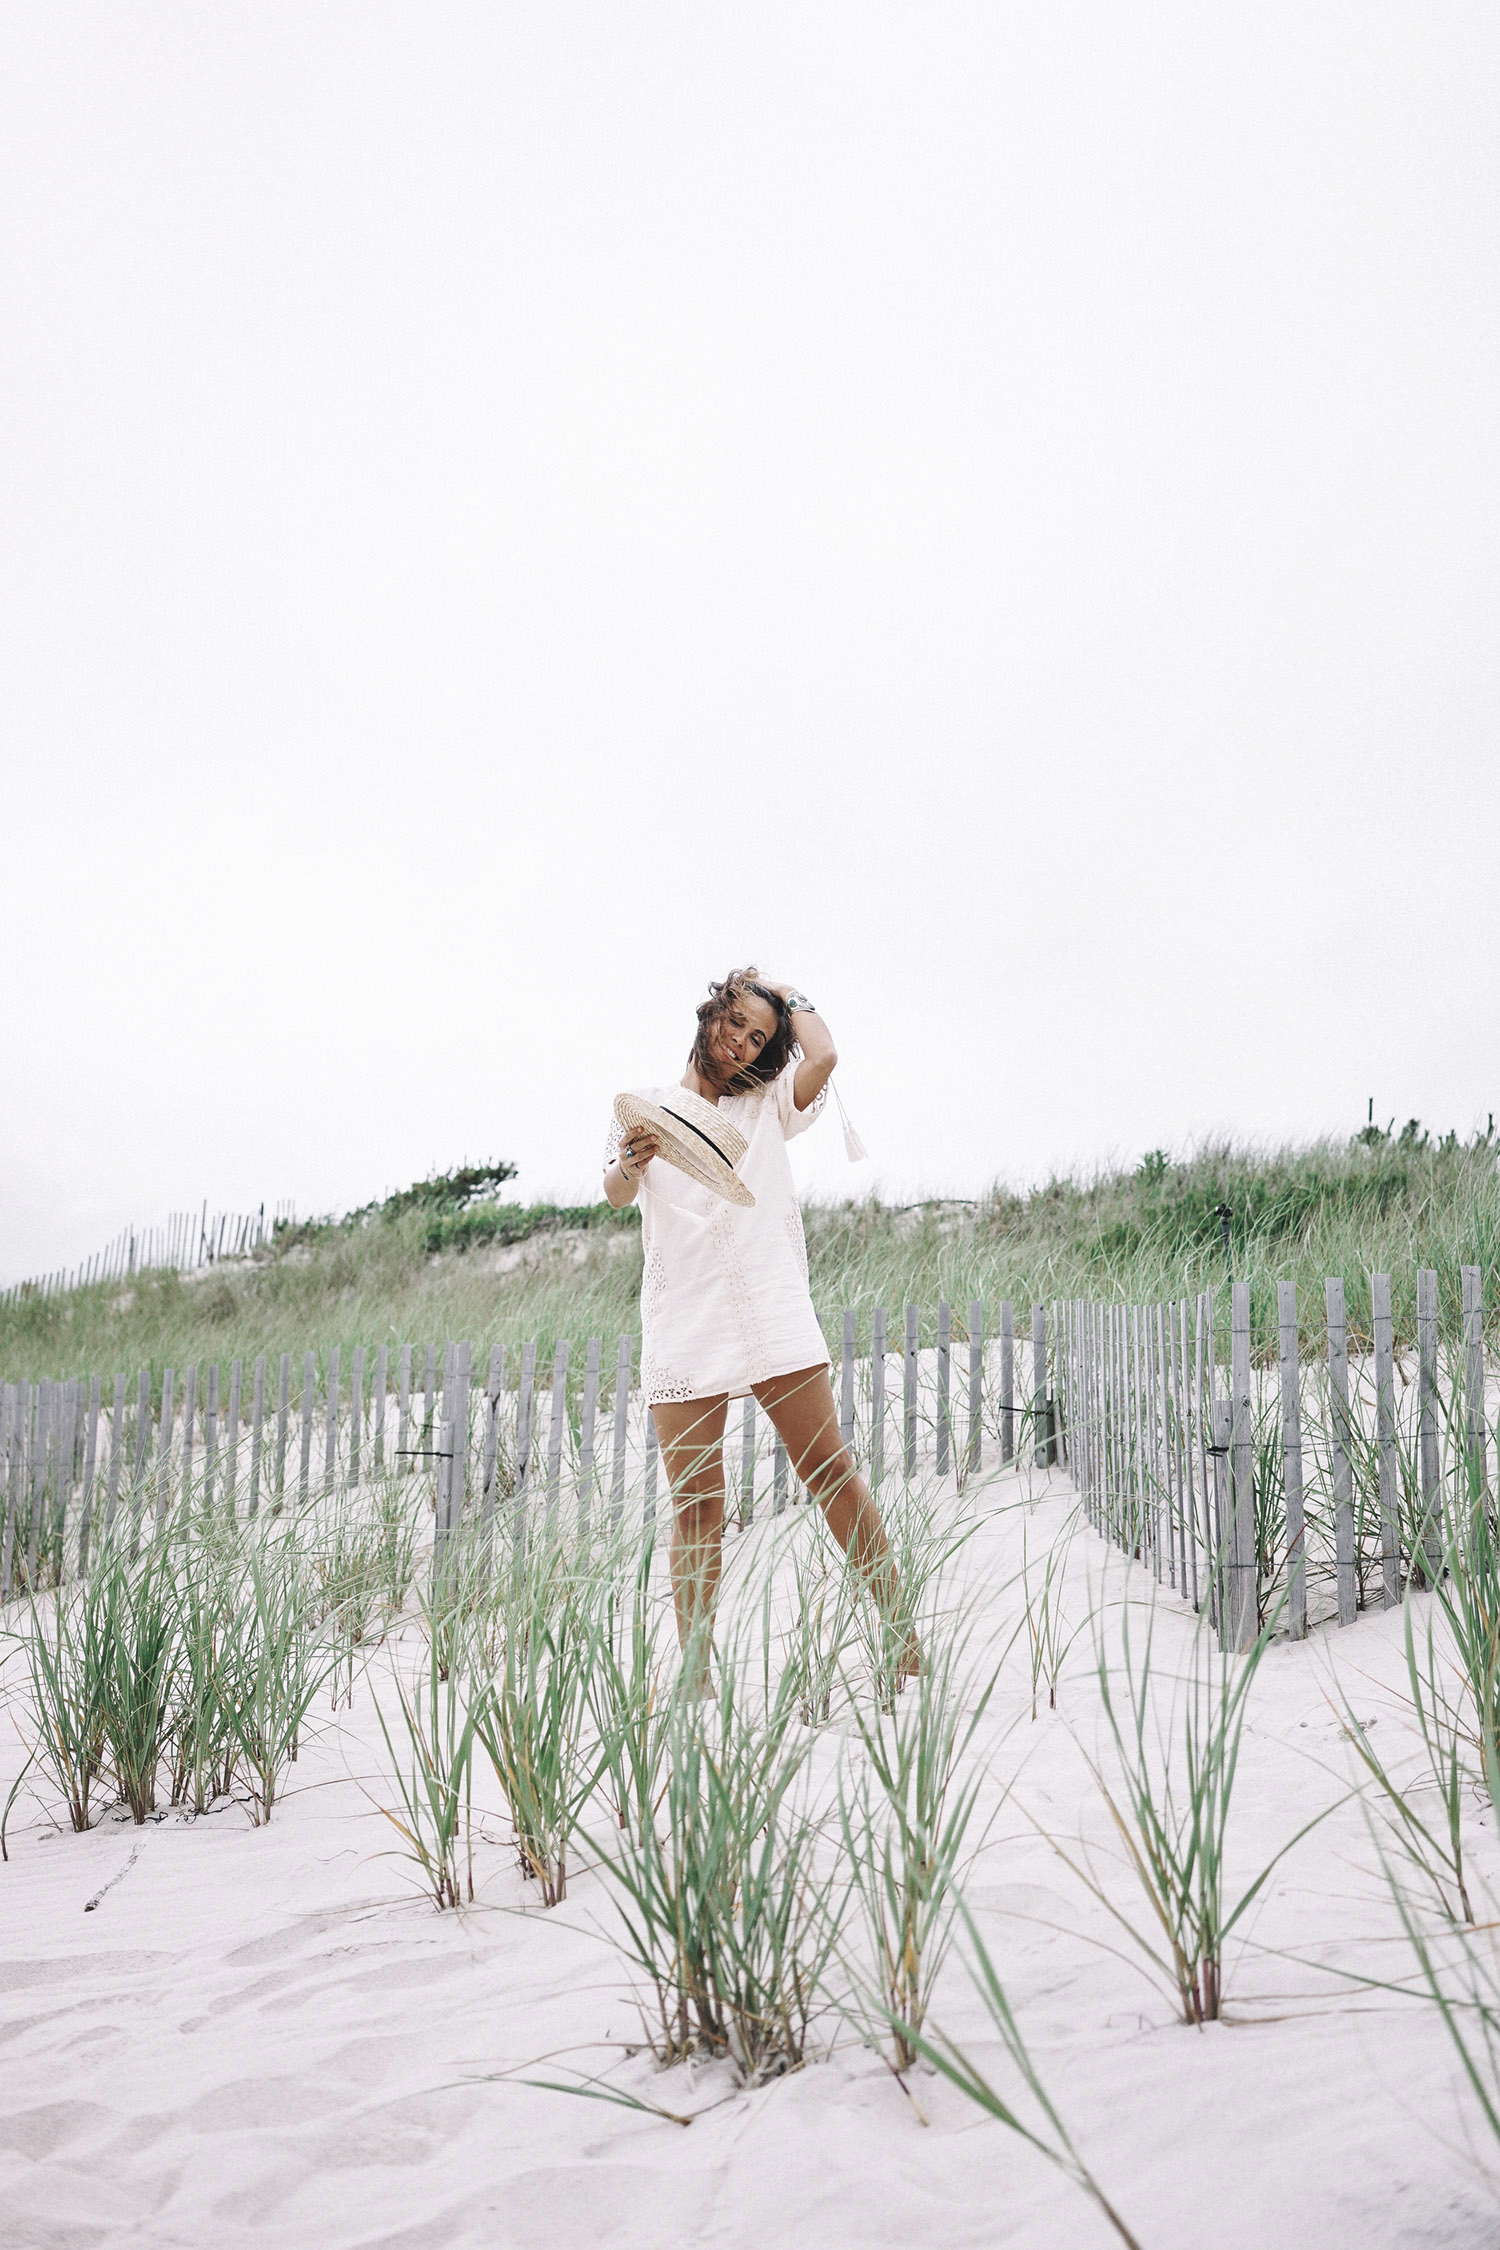 Revolve_in_The_Hamptons-Revolve_Clothing-Collage_Vintage-Cream_Dress-Tularosa-Canotier-121